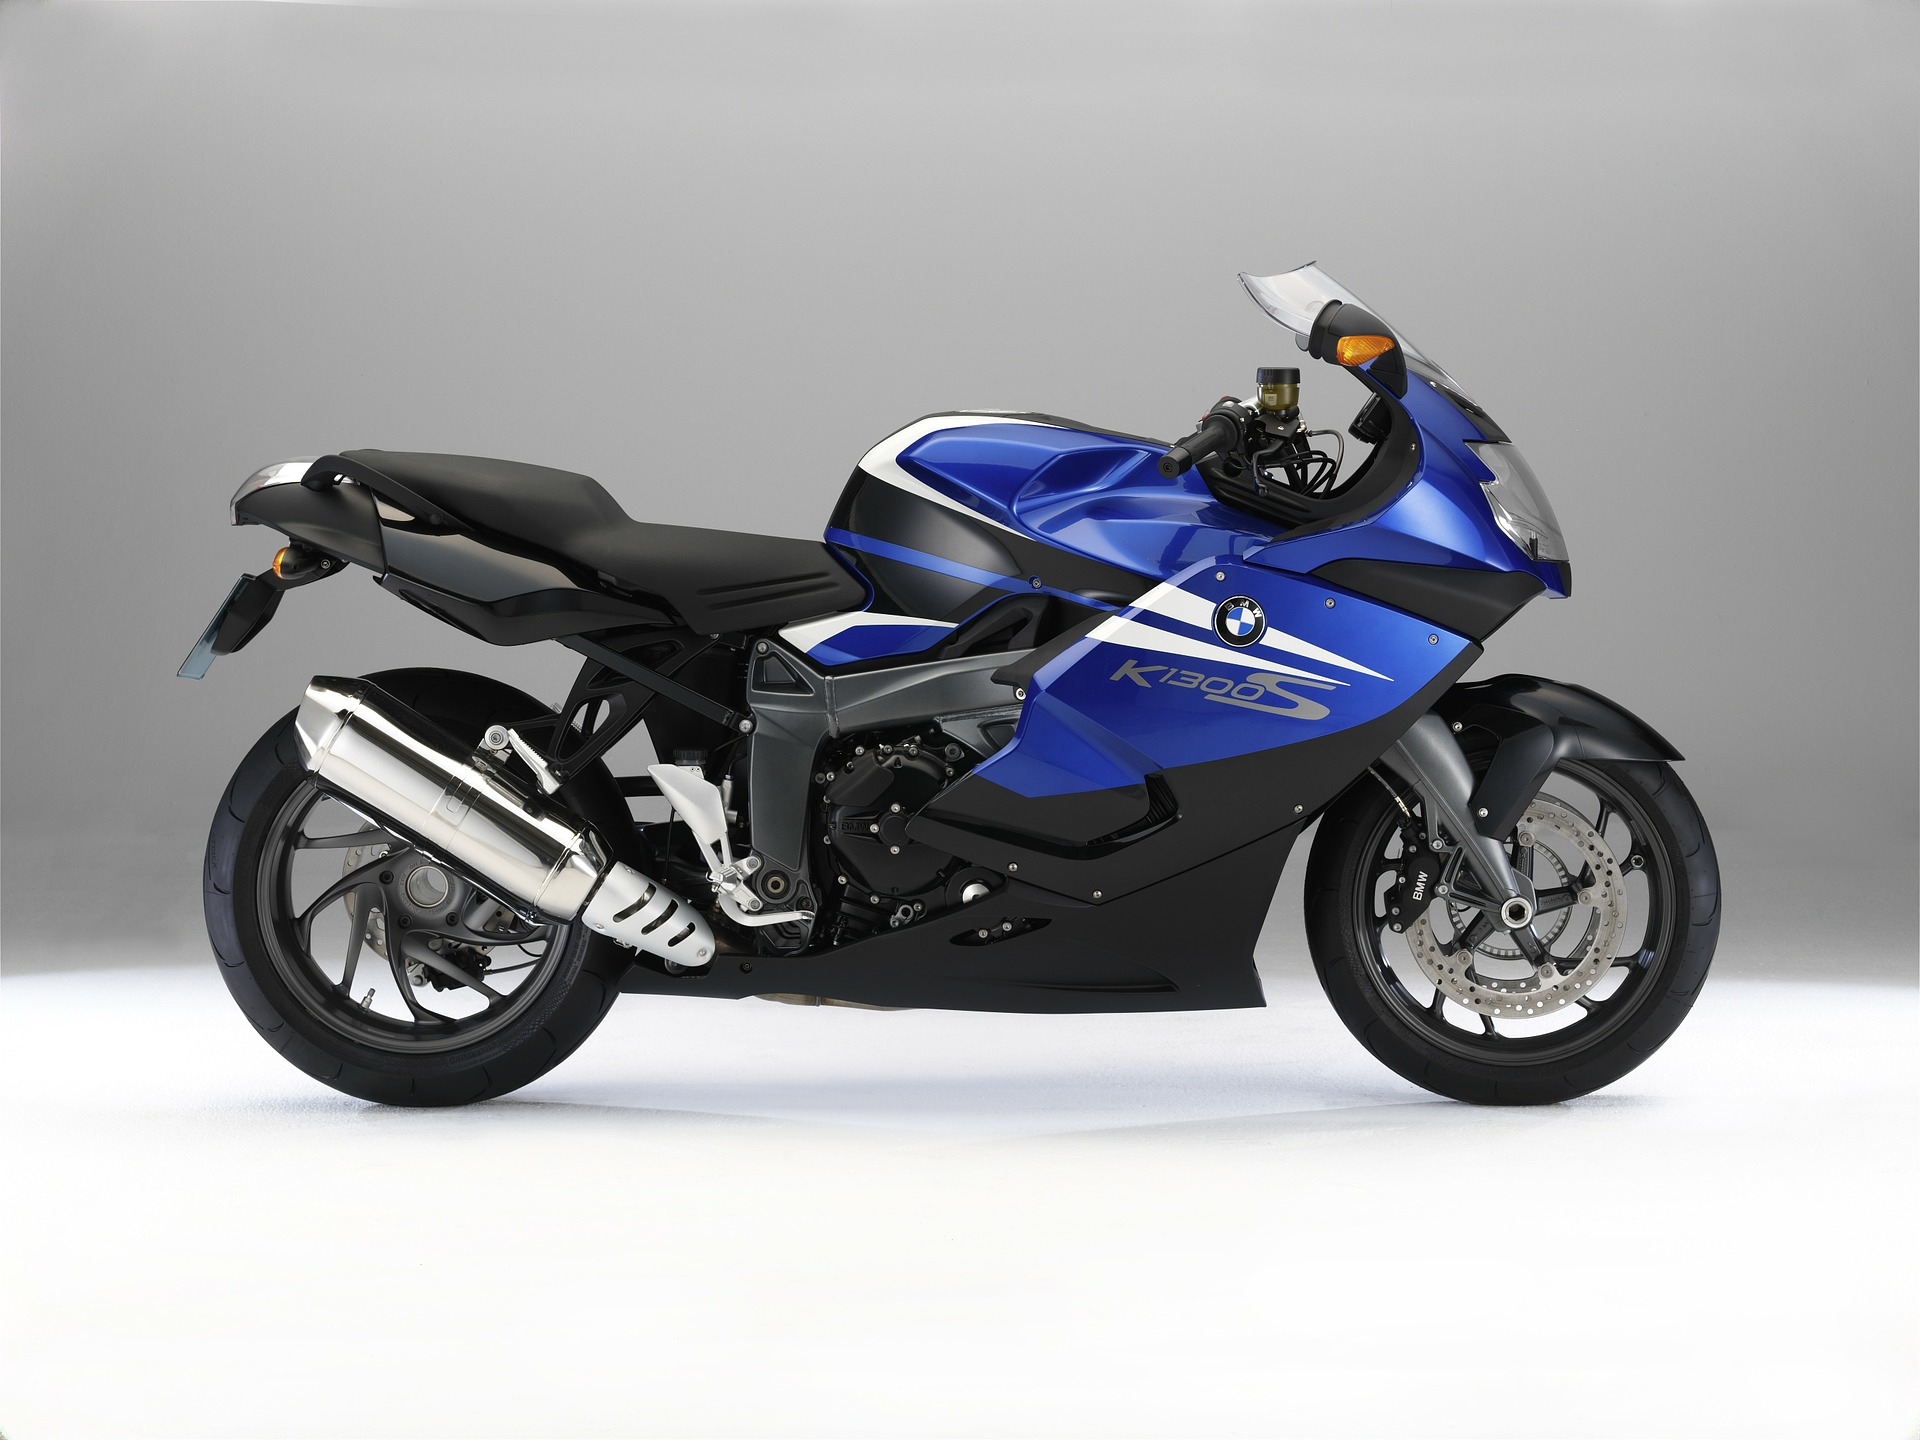 BMW, Bike, Motor, Motorbike, Motorcycle, HQ Photo